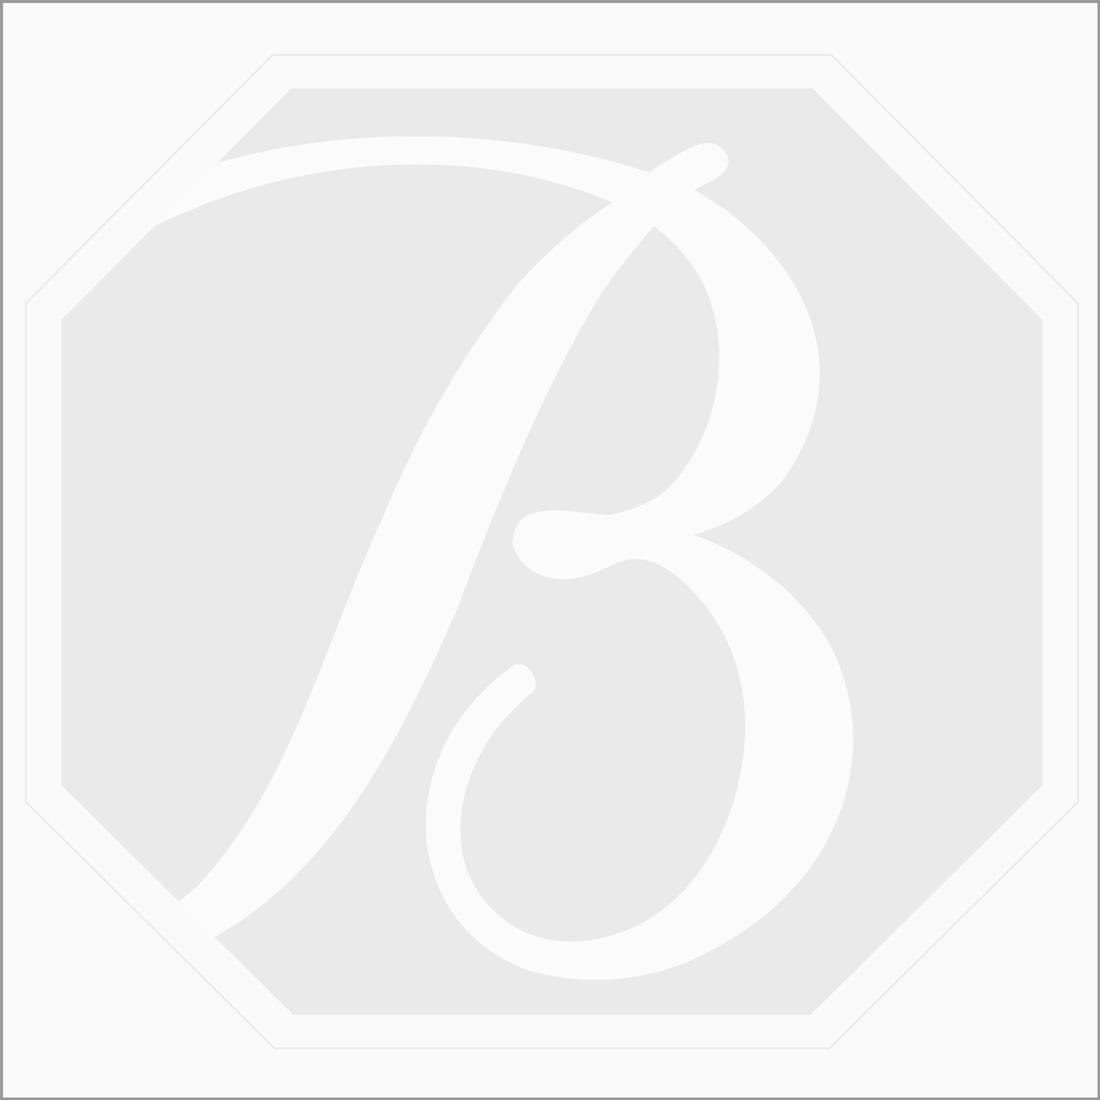 Baguettes Shape White Diamond Earrings in 18kt Yellow Gold - 9 grams - EST1361